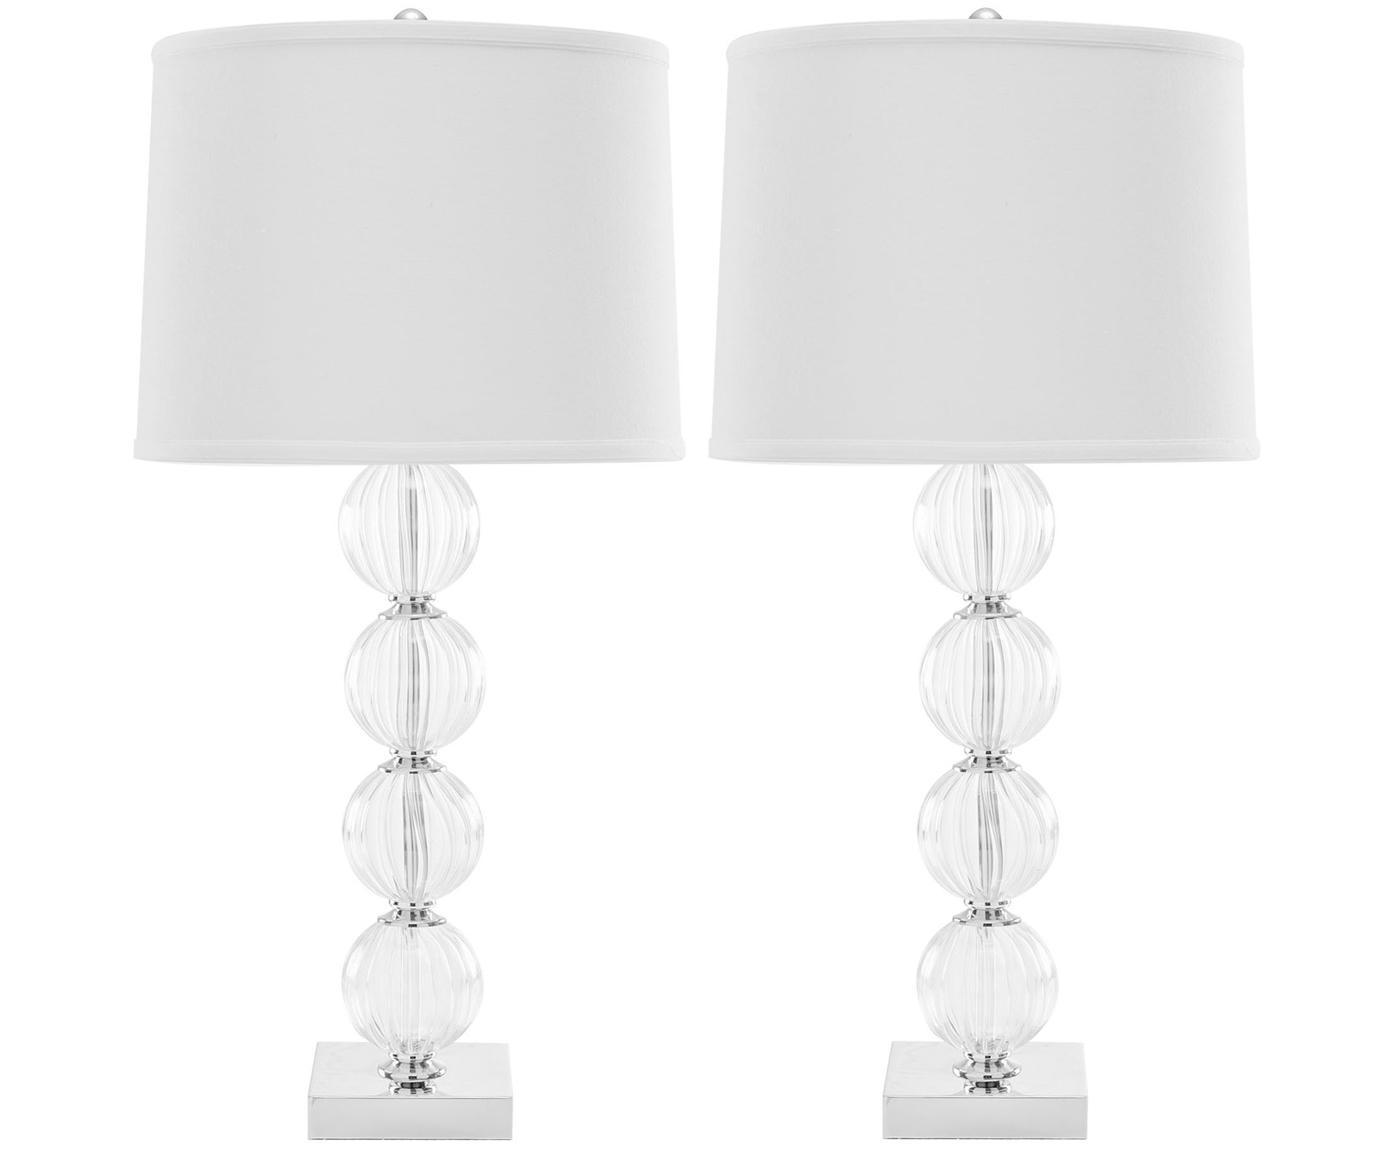 Grote tafellampen Luisa, 2 stuks, Lampenkap: 100% polyester, Lampvoet: glas, metaal, Lampenkap: wit. Lampvoet: transparant, Ø 38 x H 76 cm